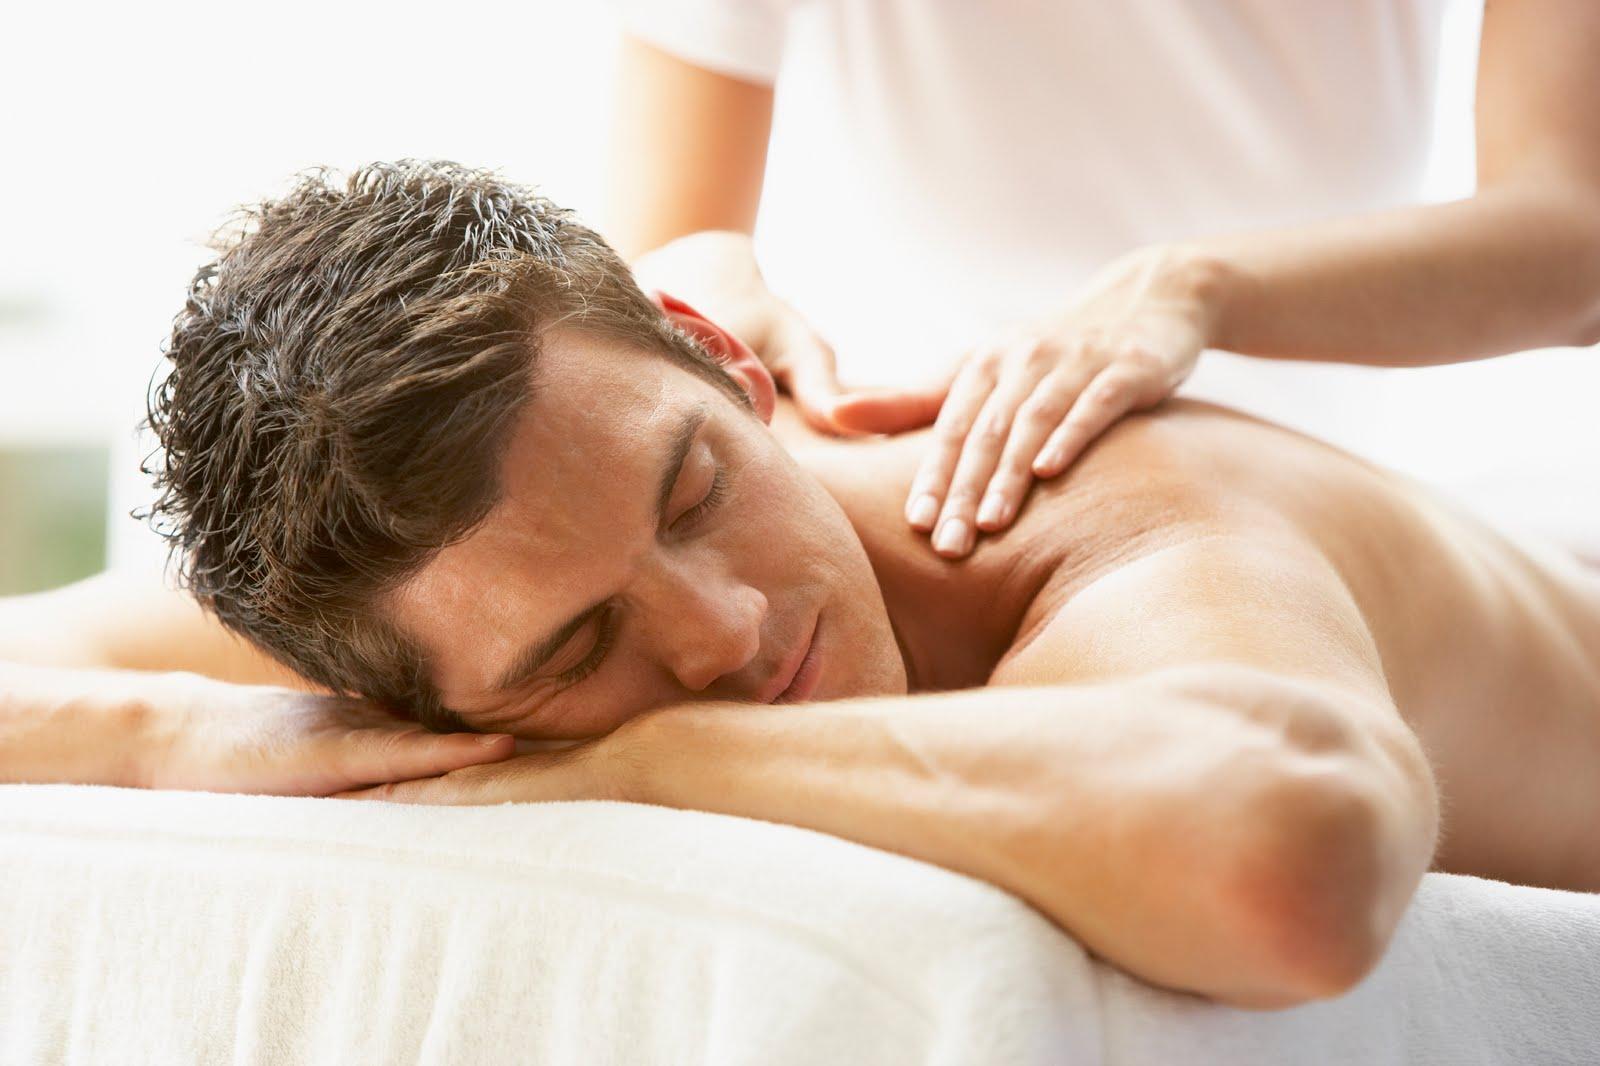 Massage places in modesto